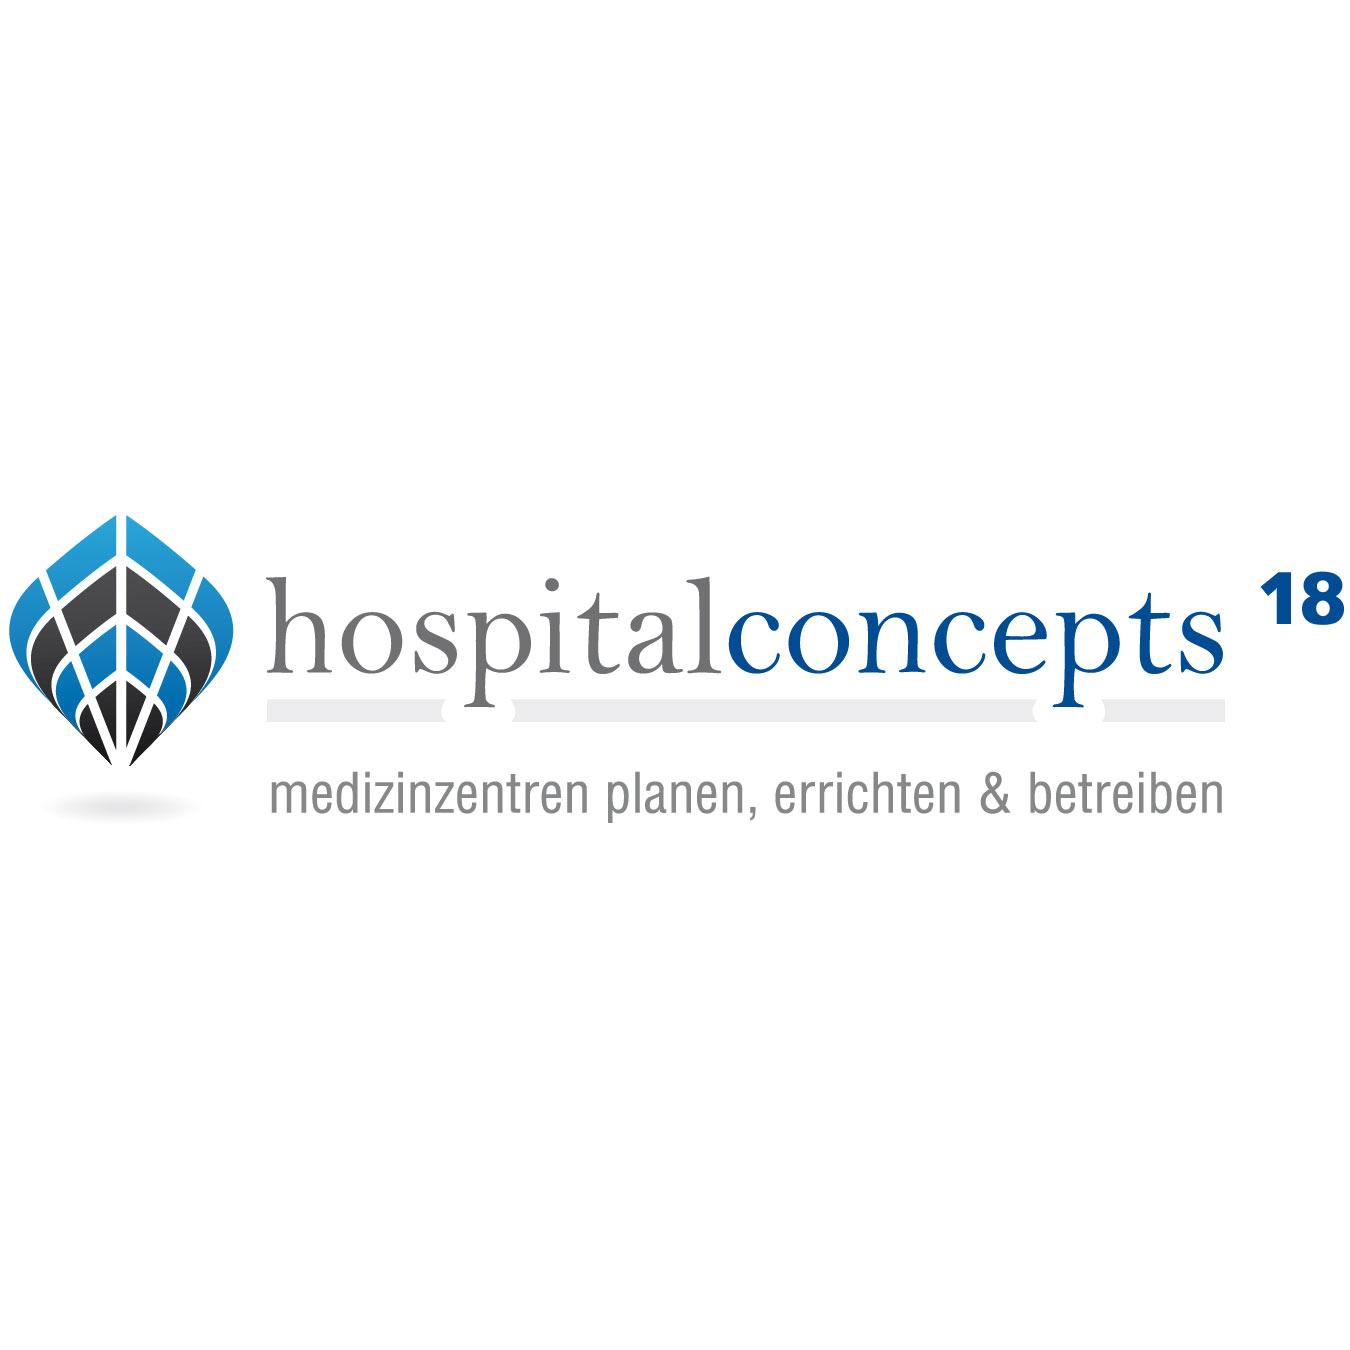 hospitalconcepts